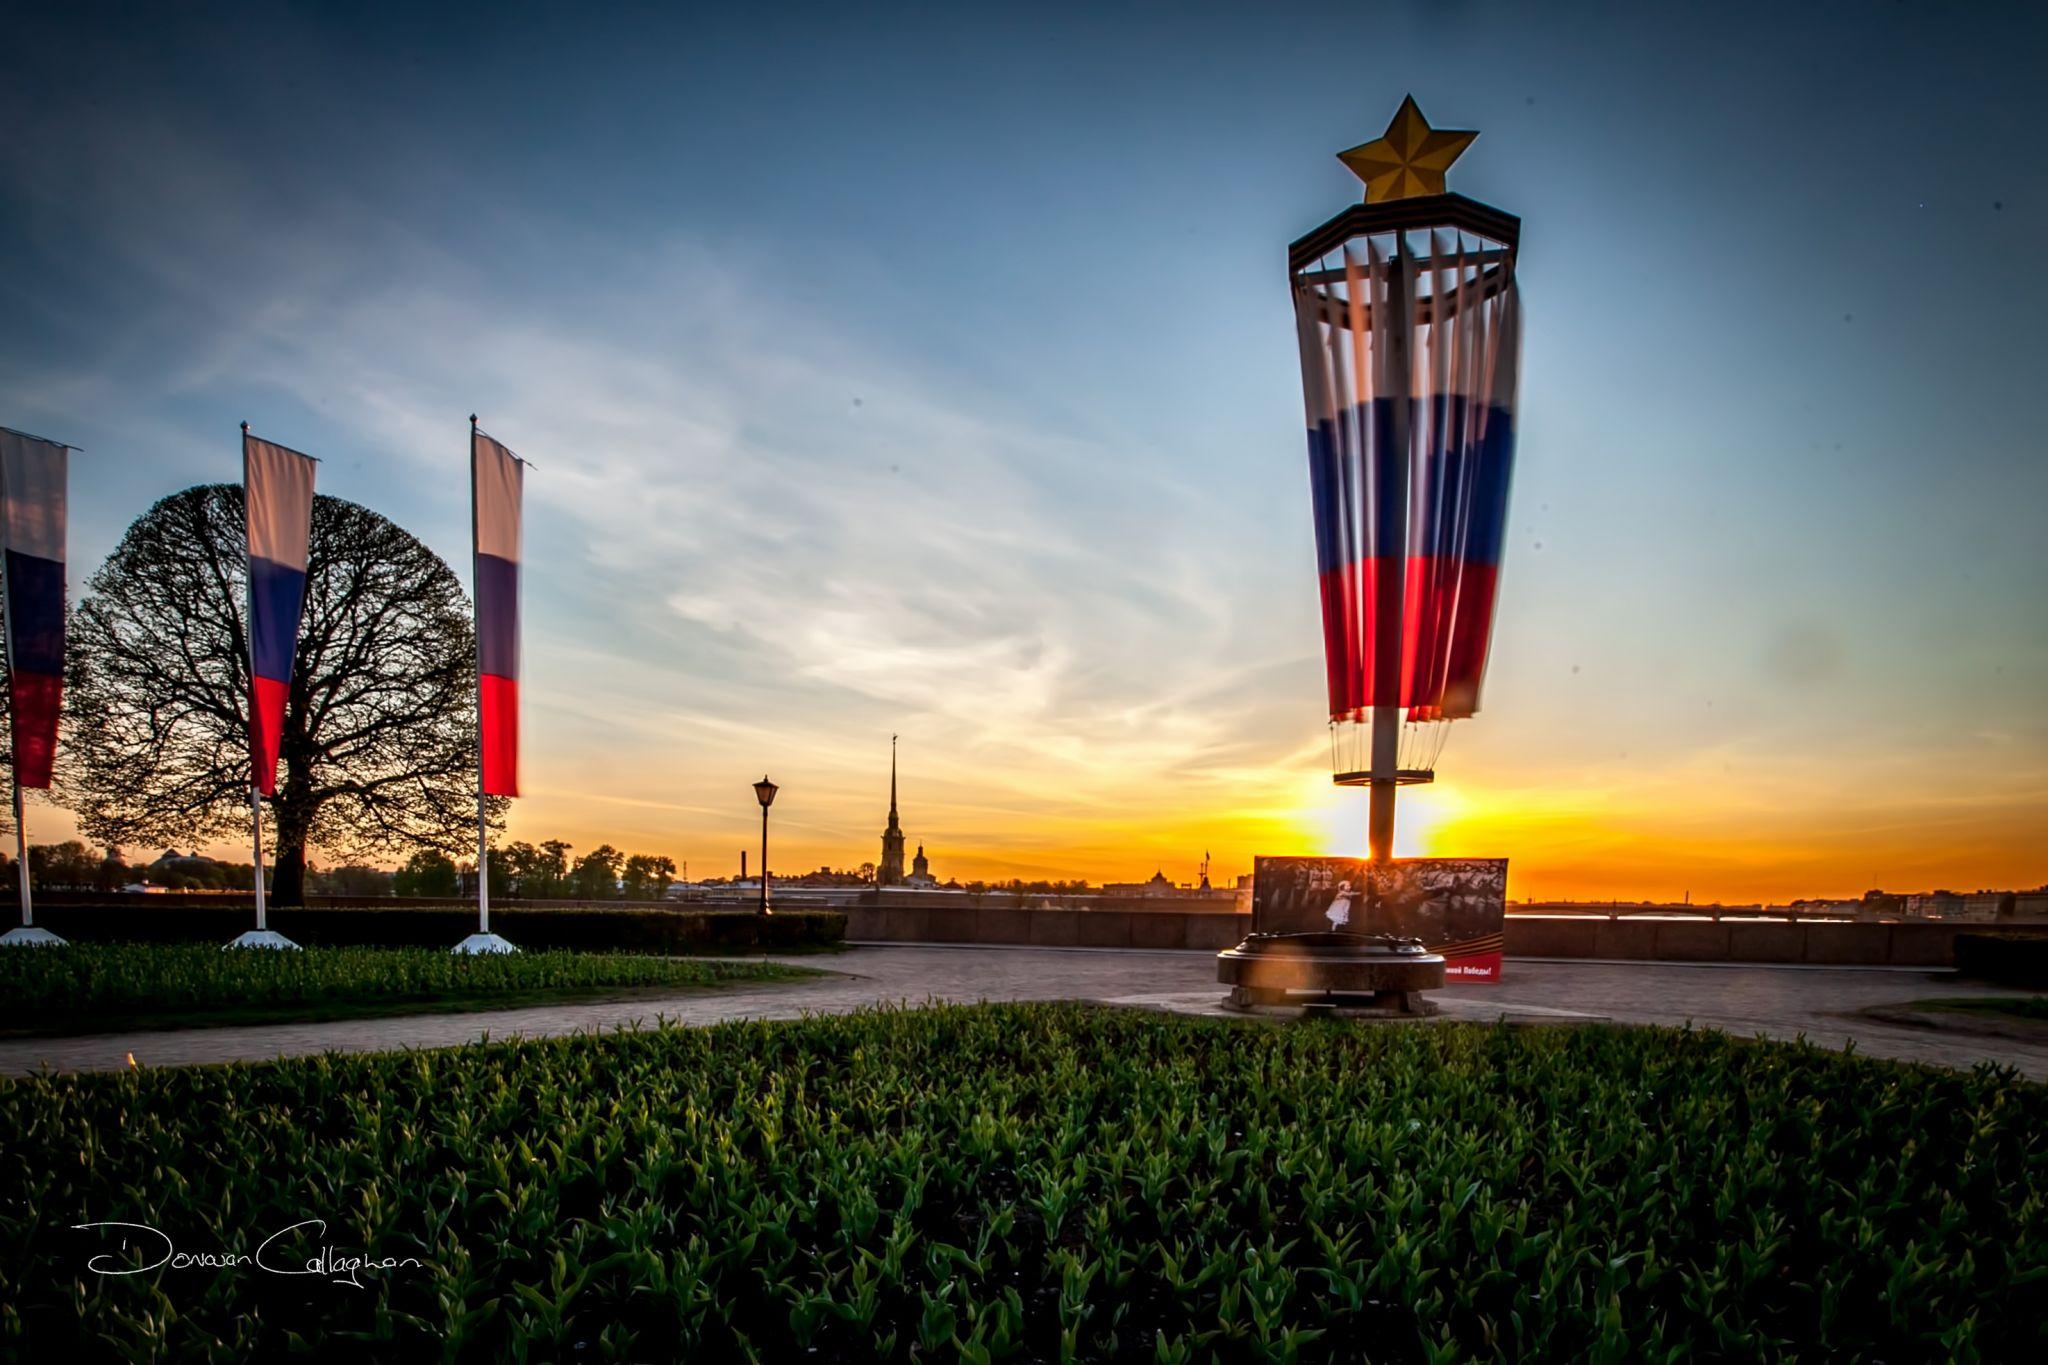 Sunrise Vasilievski Island, Waterfront, Saint Petersburg, Russian Federation